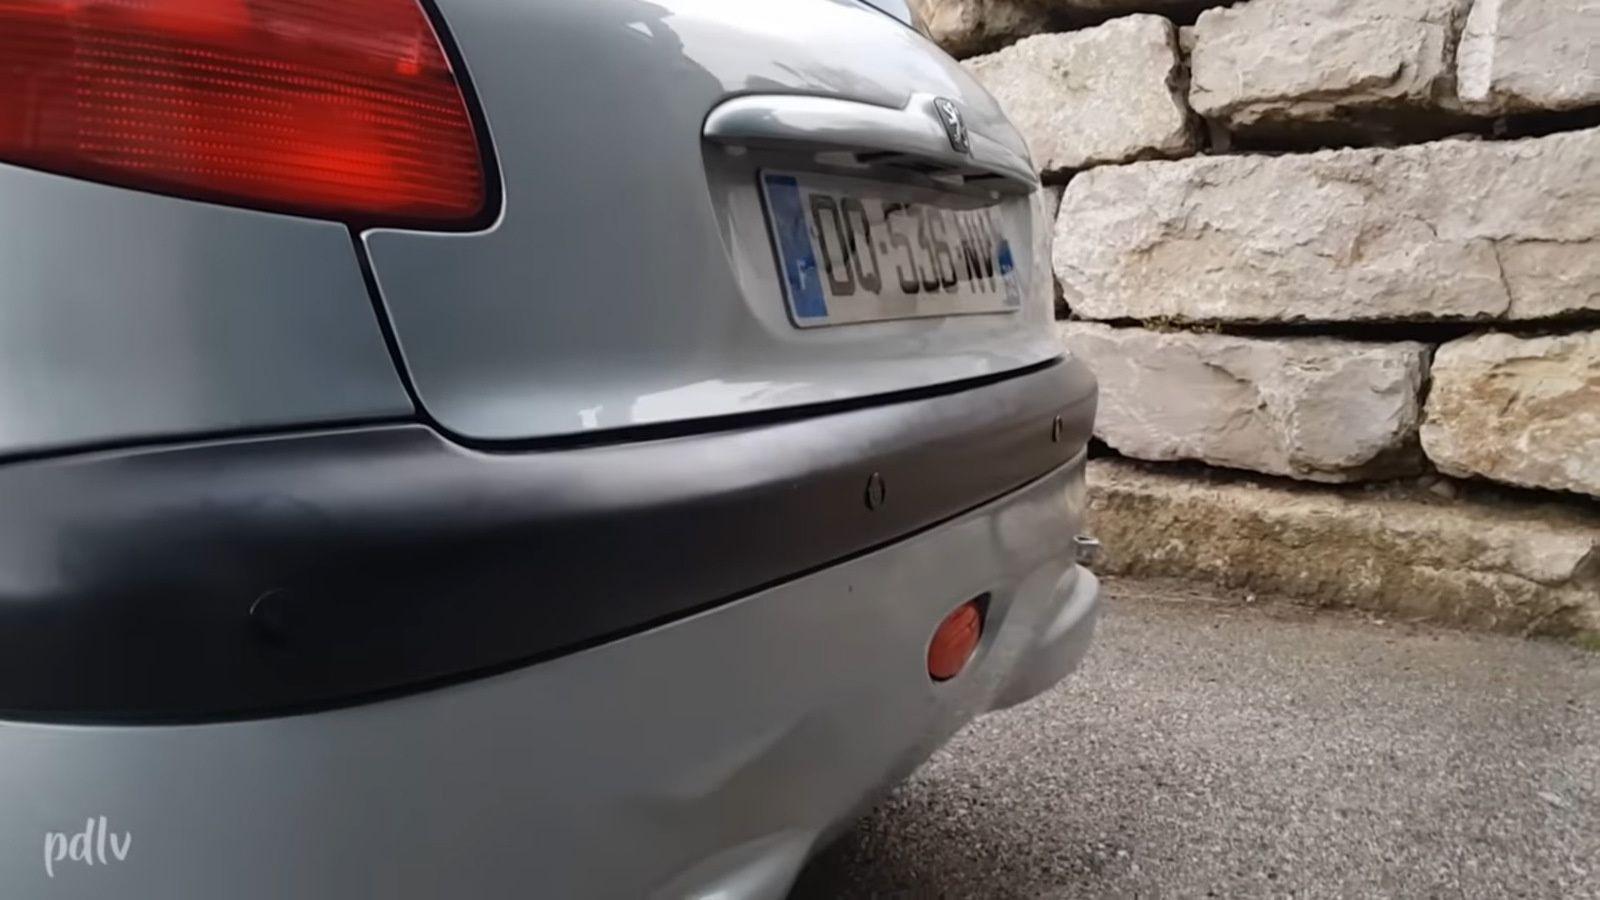 Installer des radar de recul sur sa voiture ?